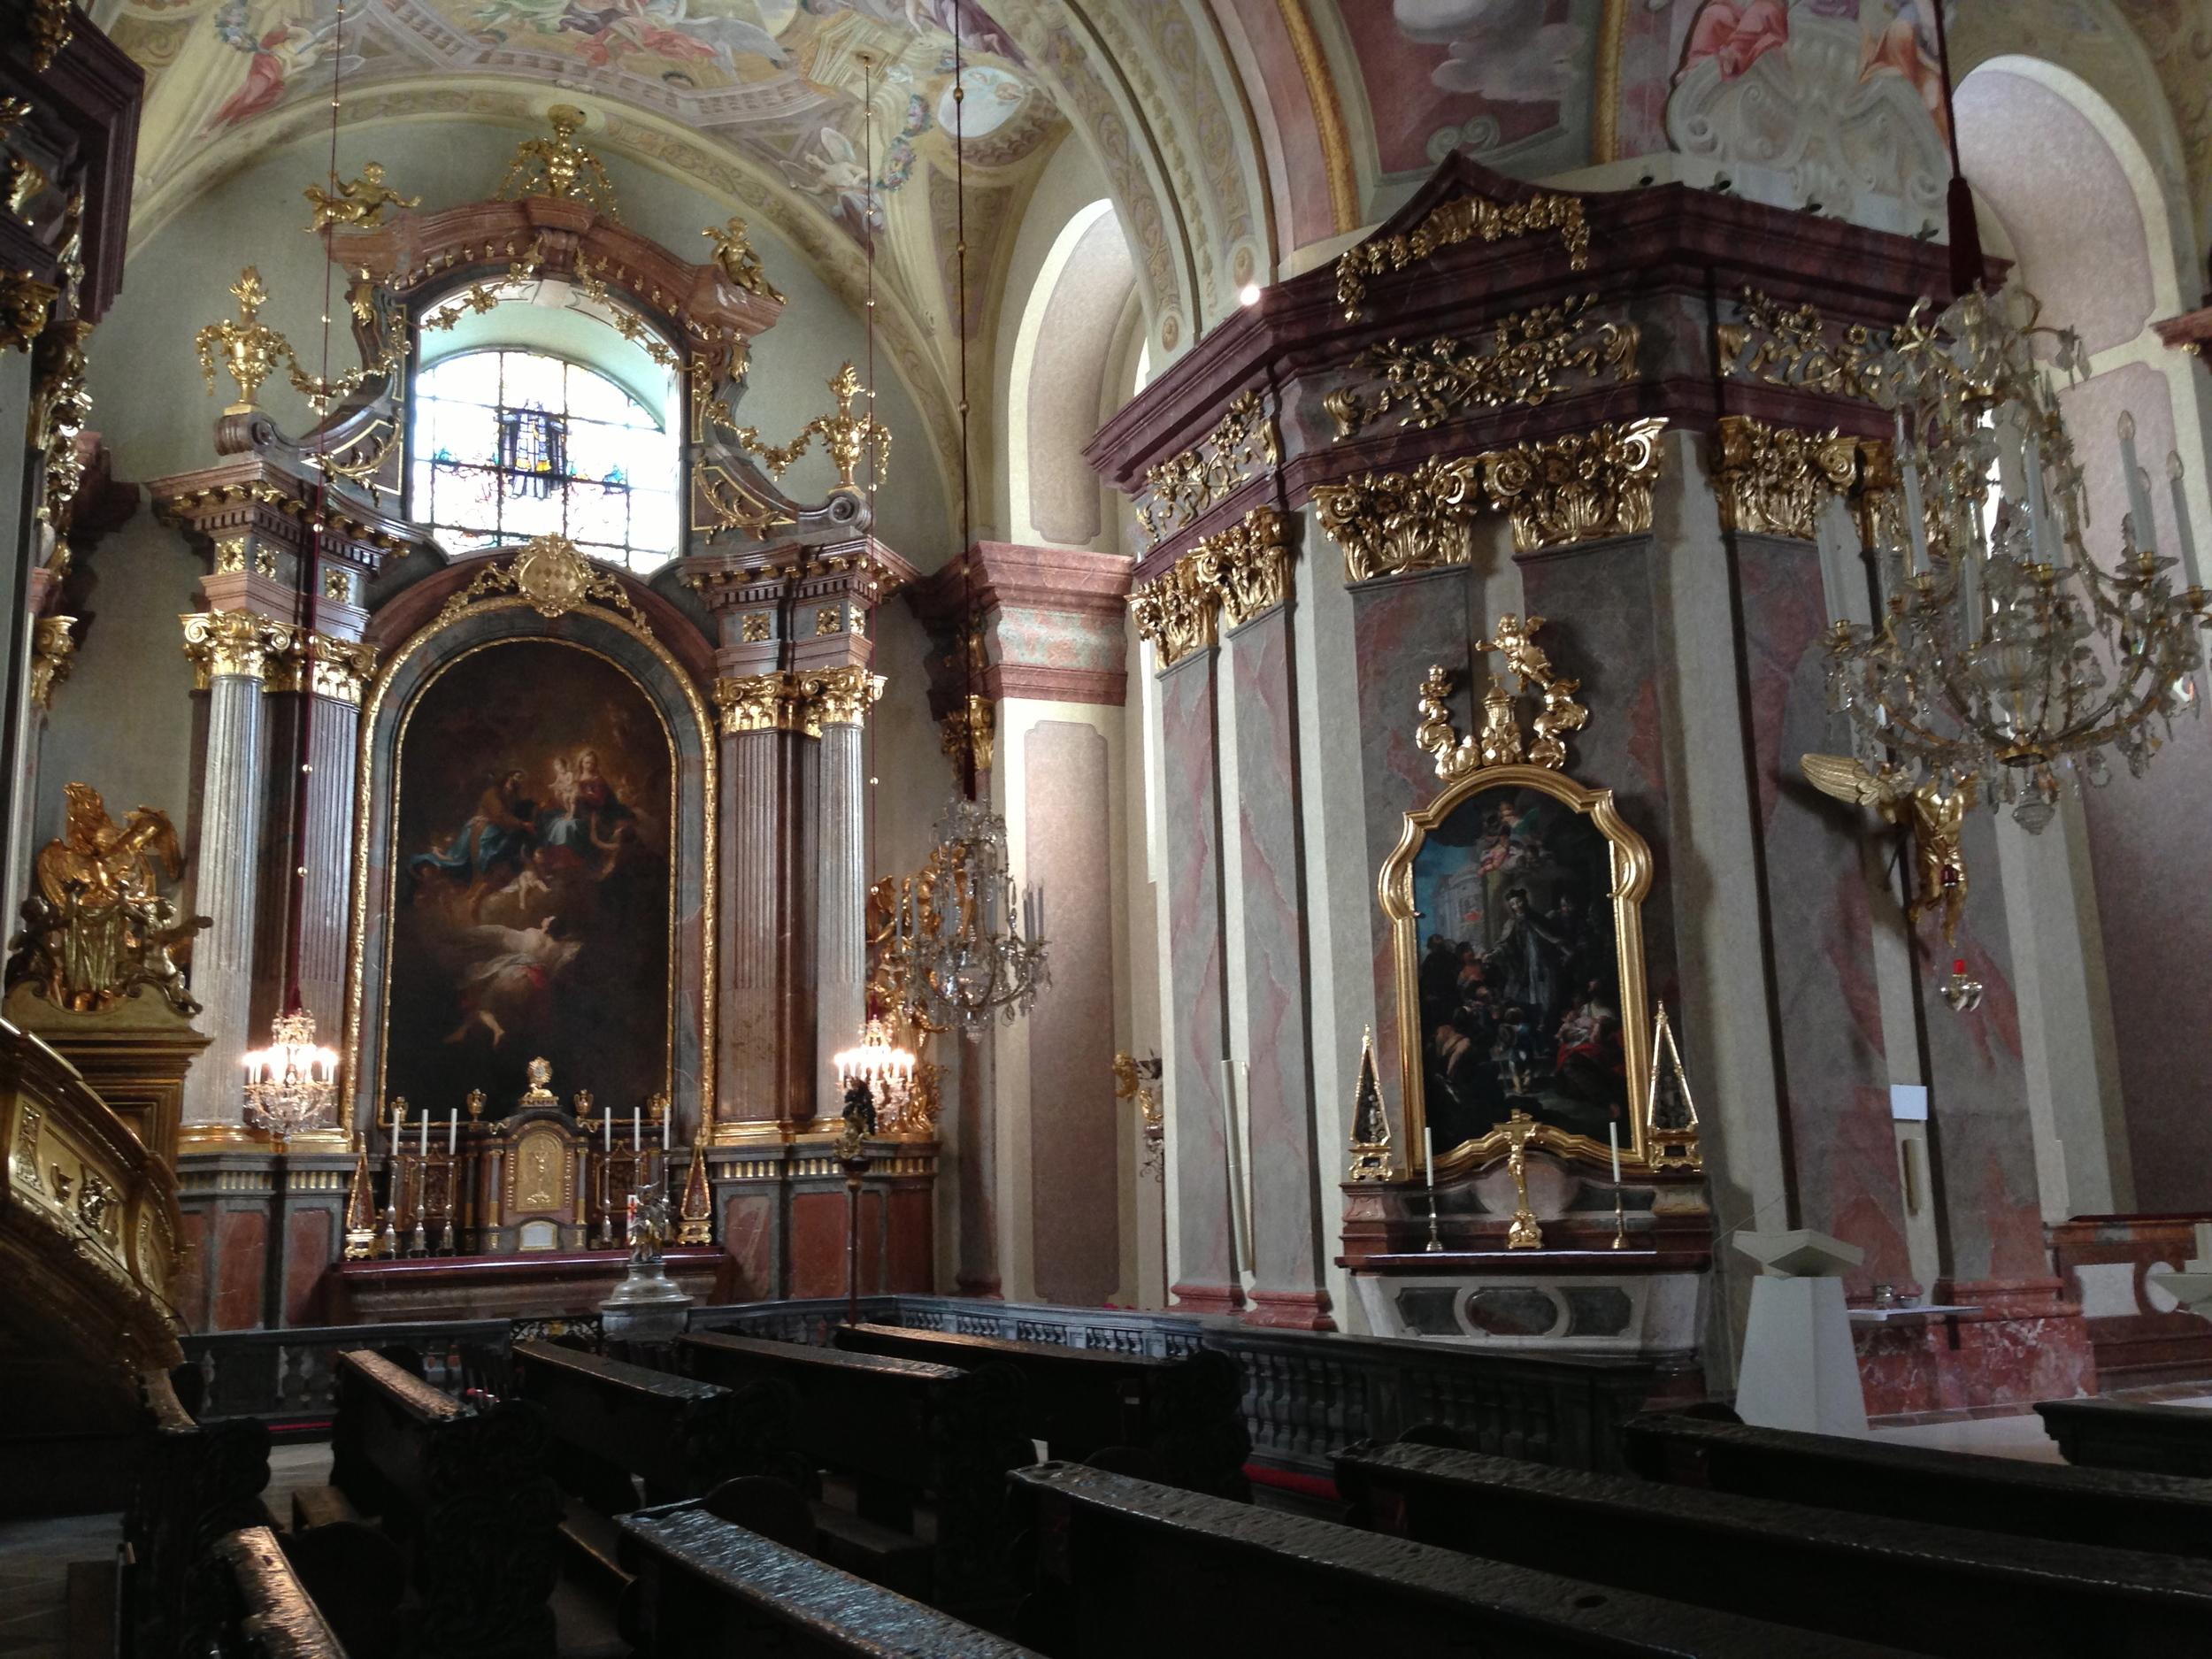 Basilika maria taferl - restaurierte gemälde